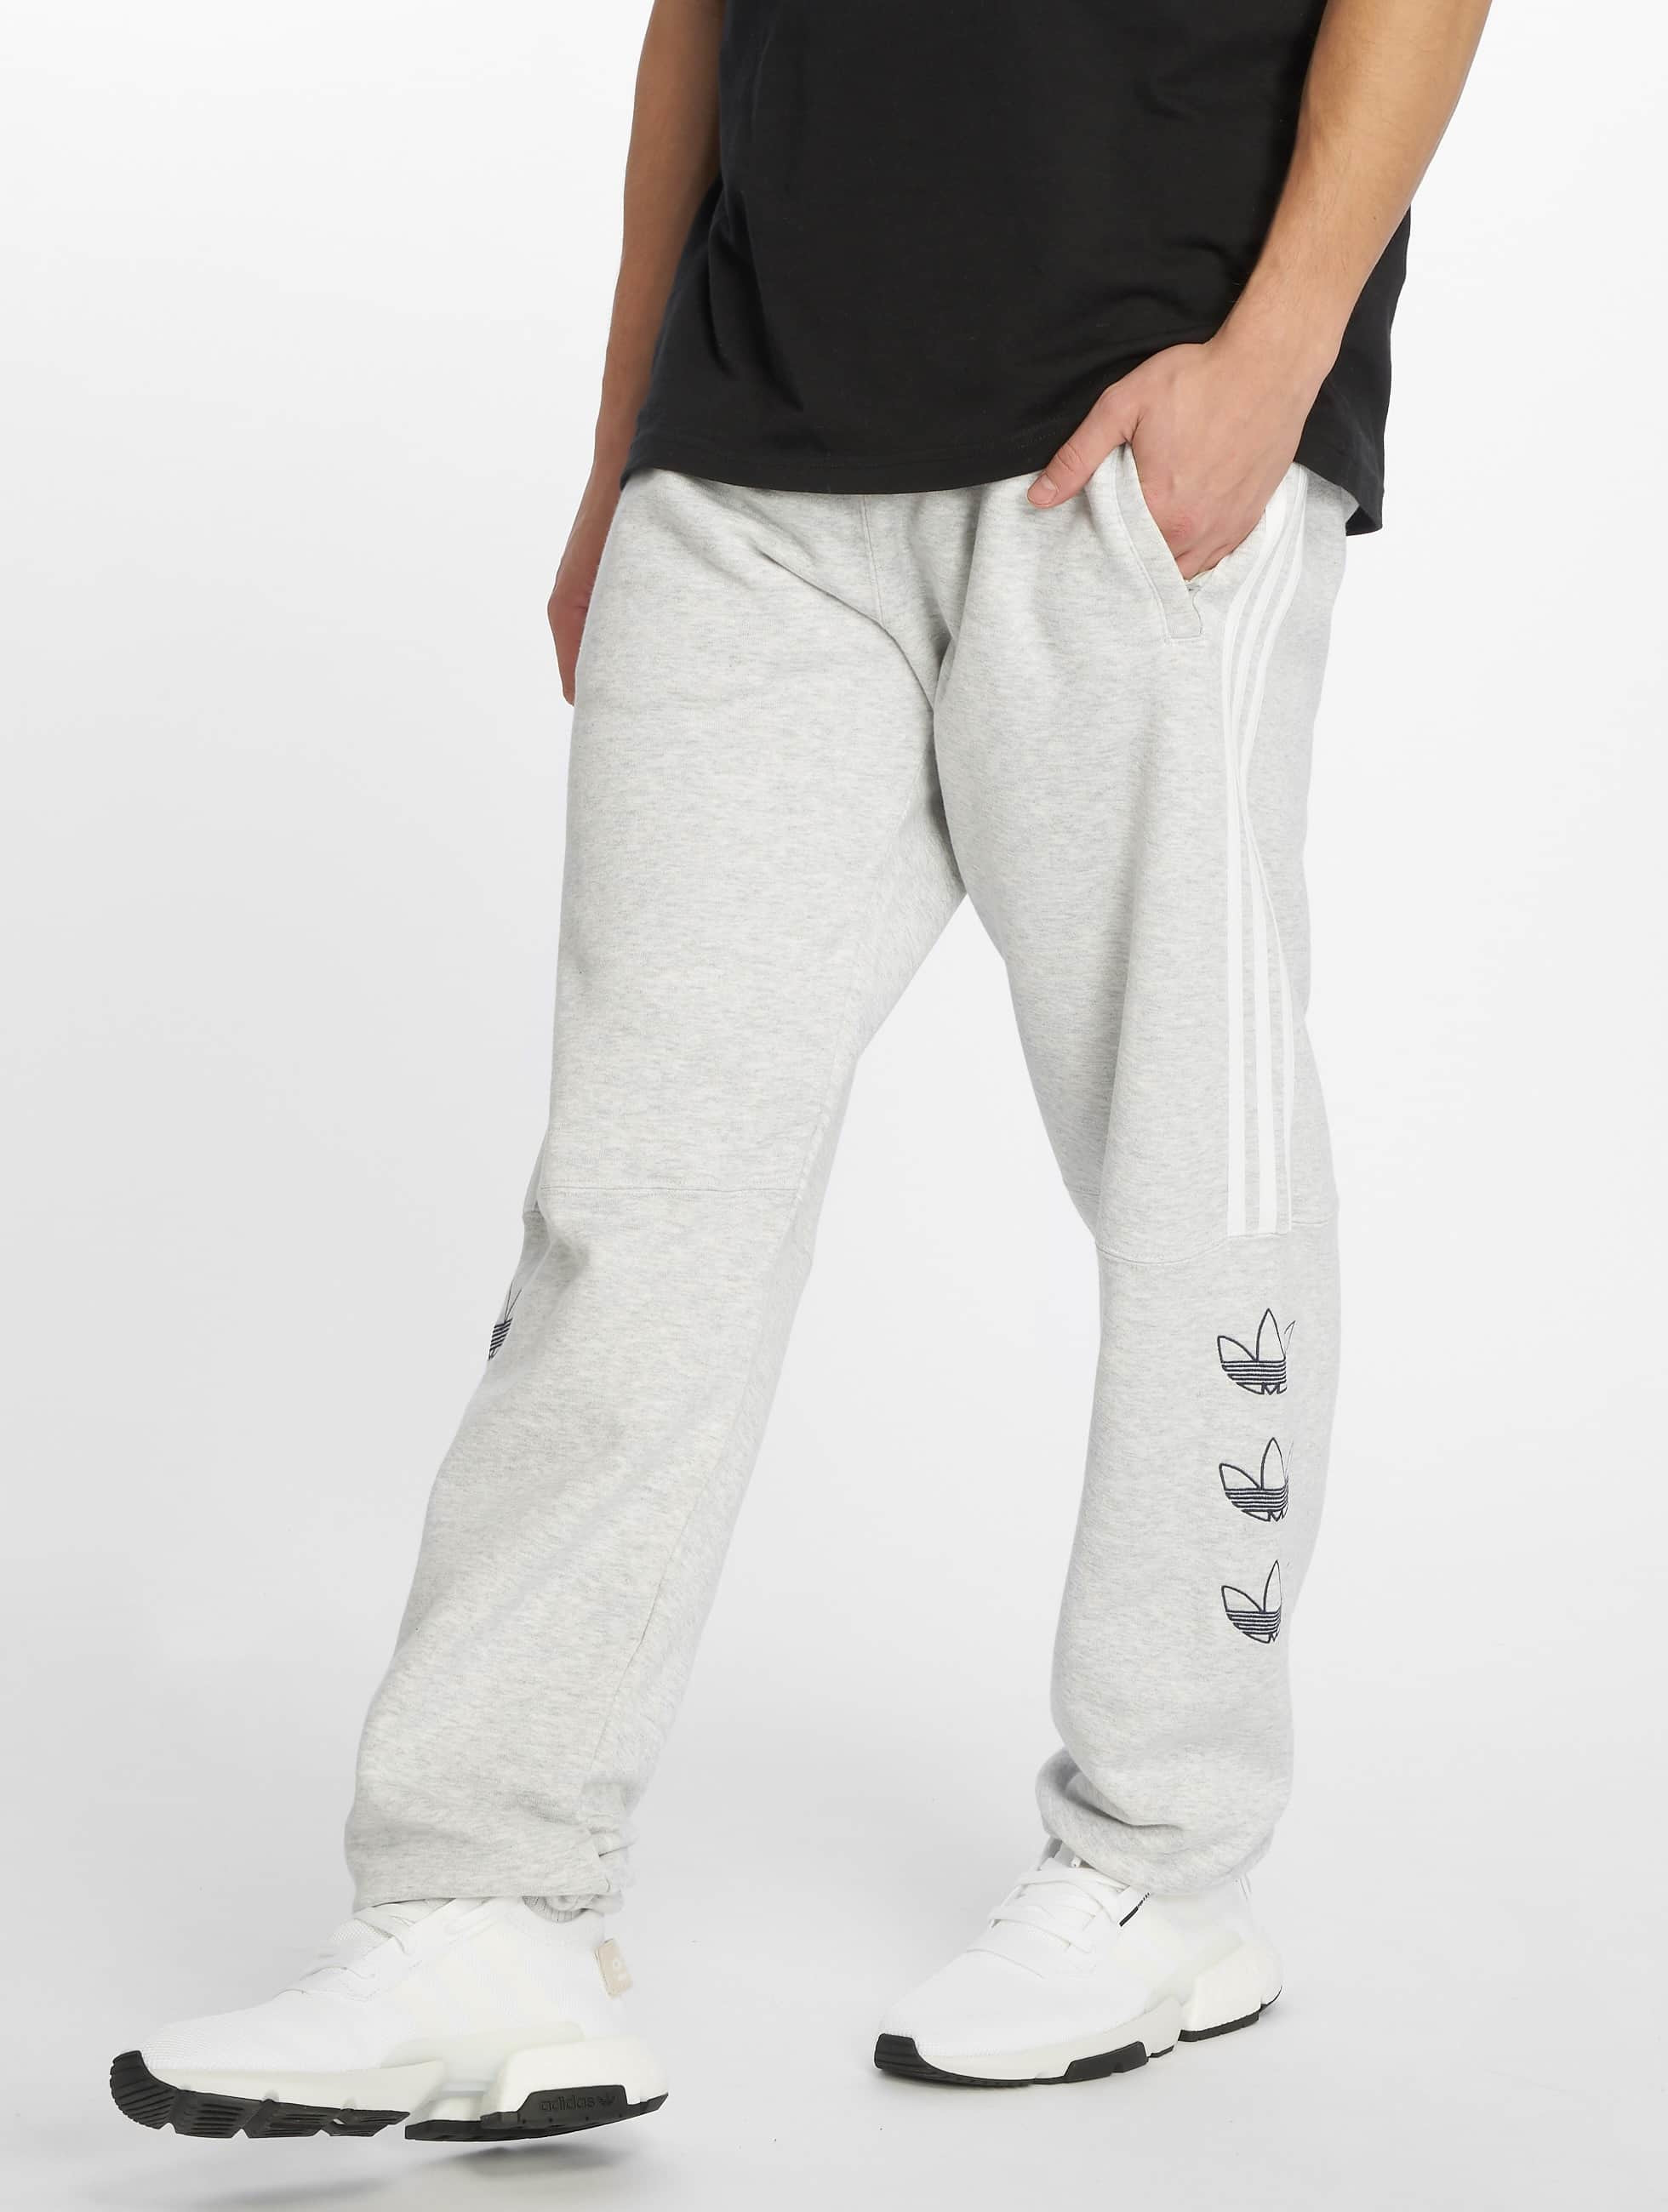 Adidas Originals Ft Sweat Pants Light Grey Heather